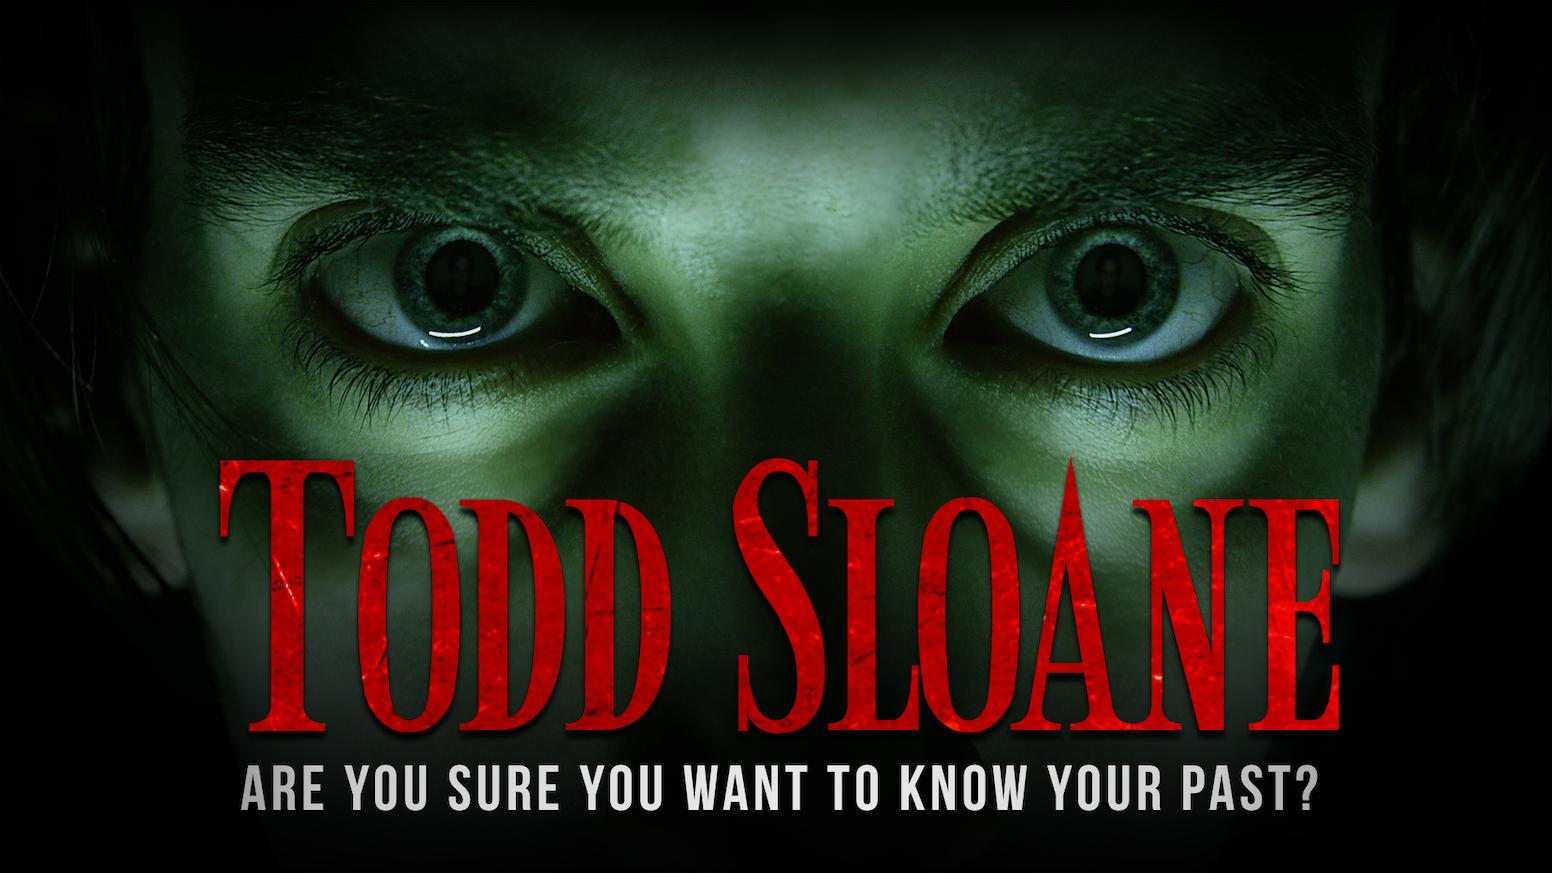 bff0ed32c38 Todd Sloane Short Film by Get New Design — Kickstarter